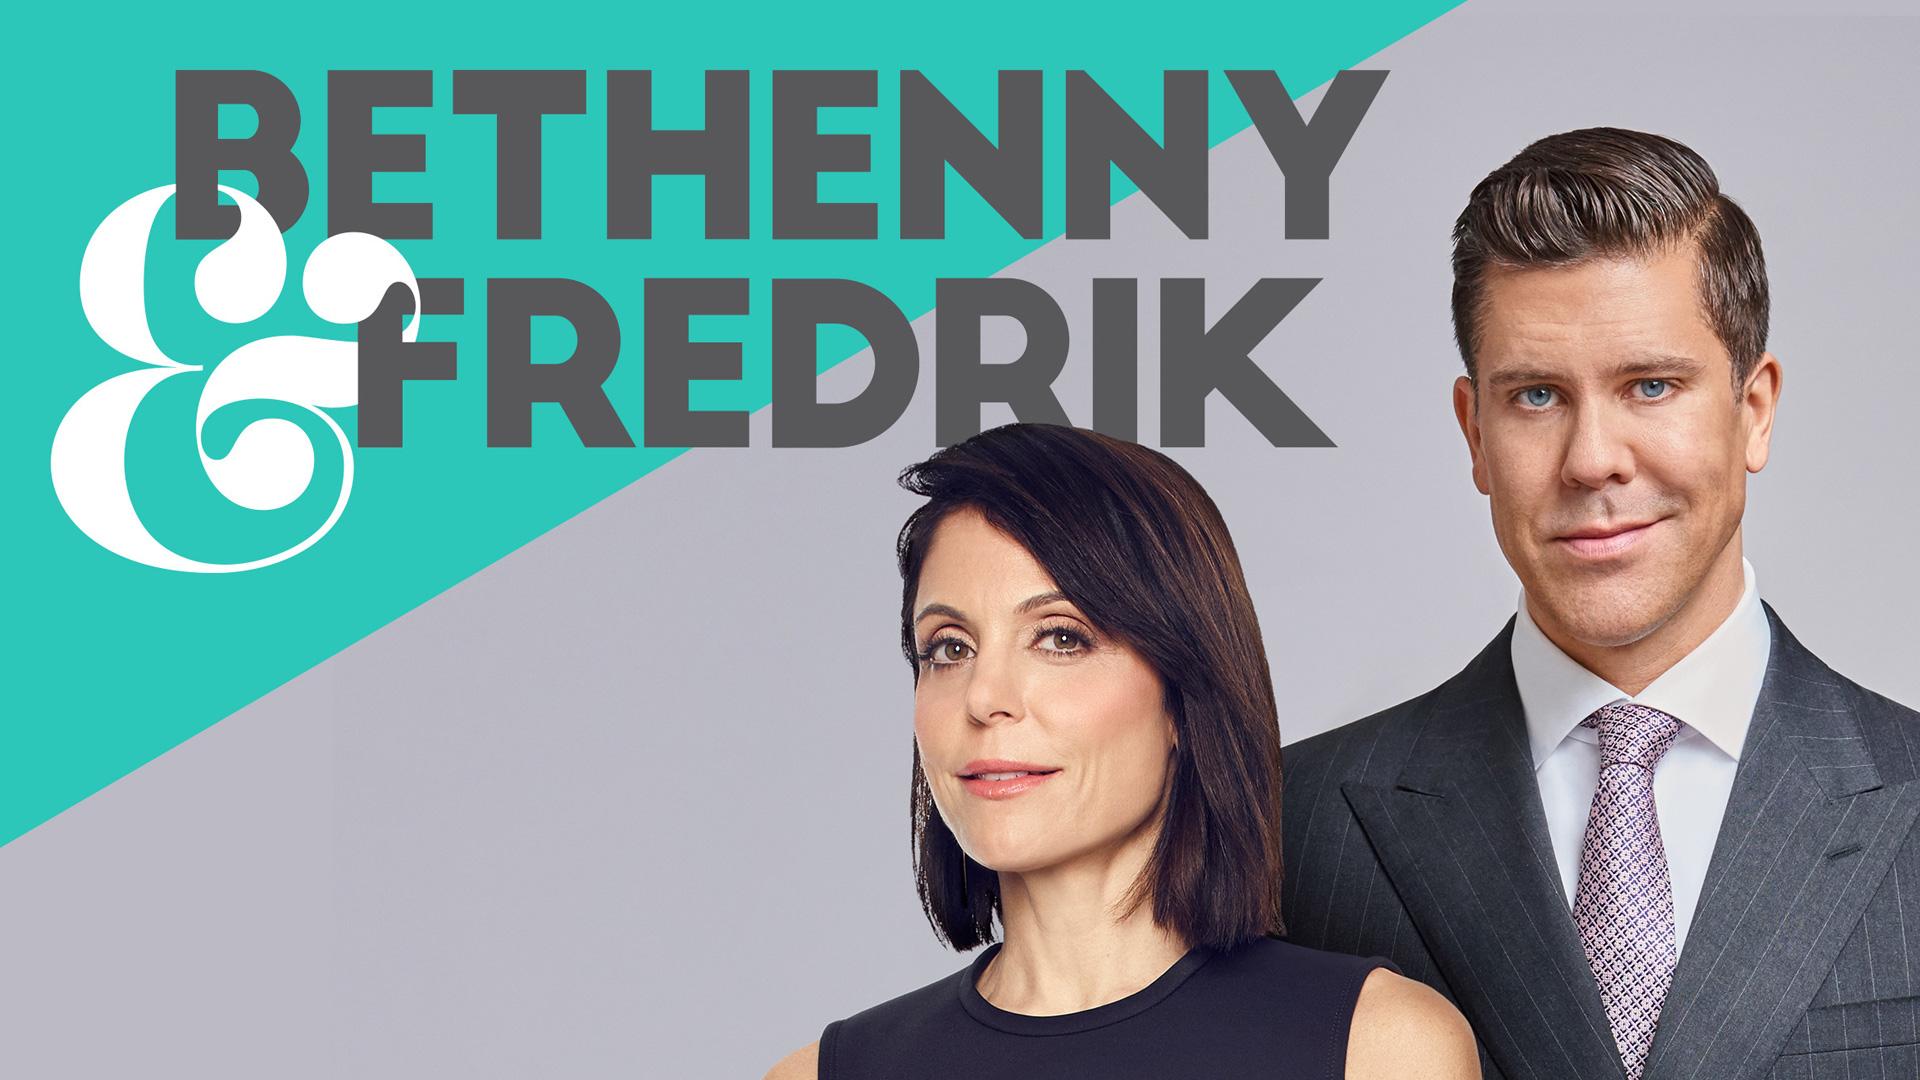 Bethenny & Fredrik, Season 1